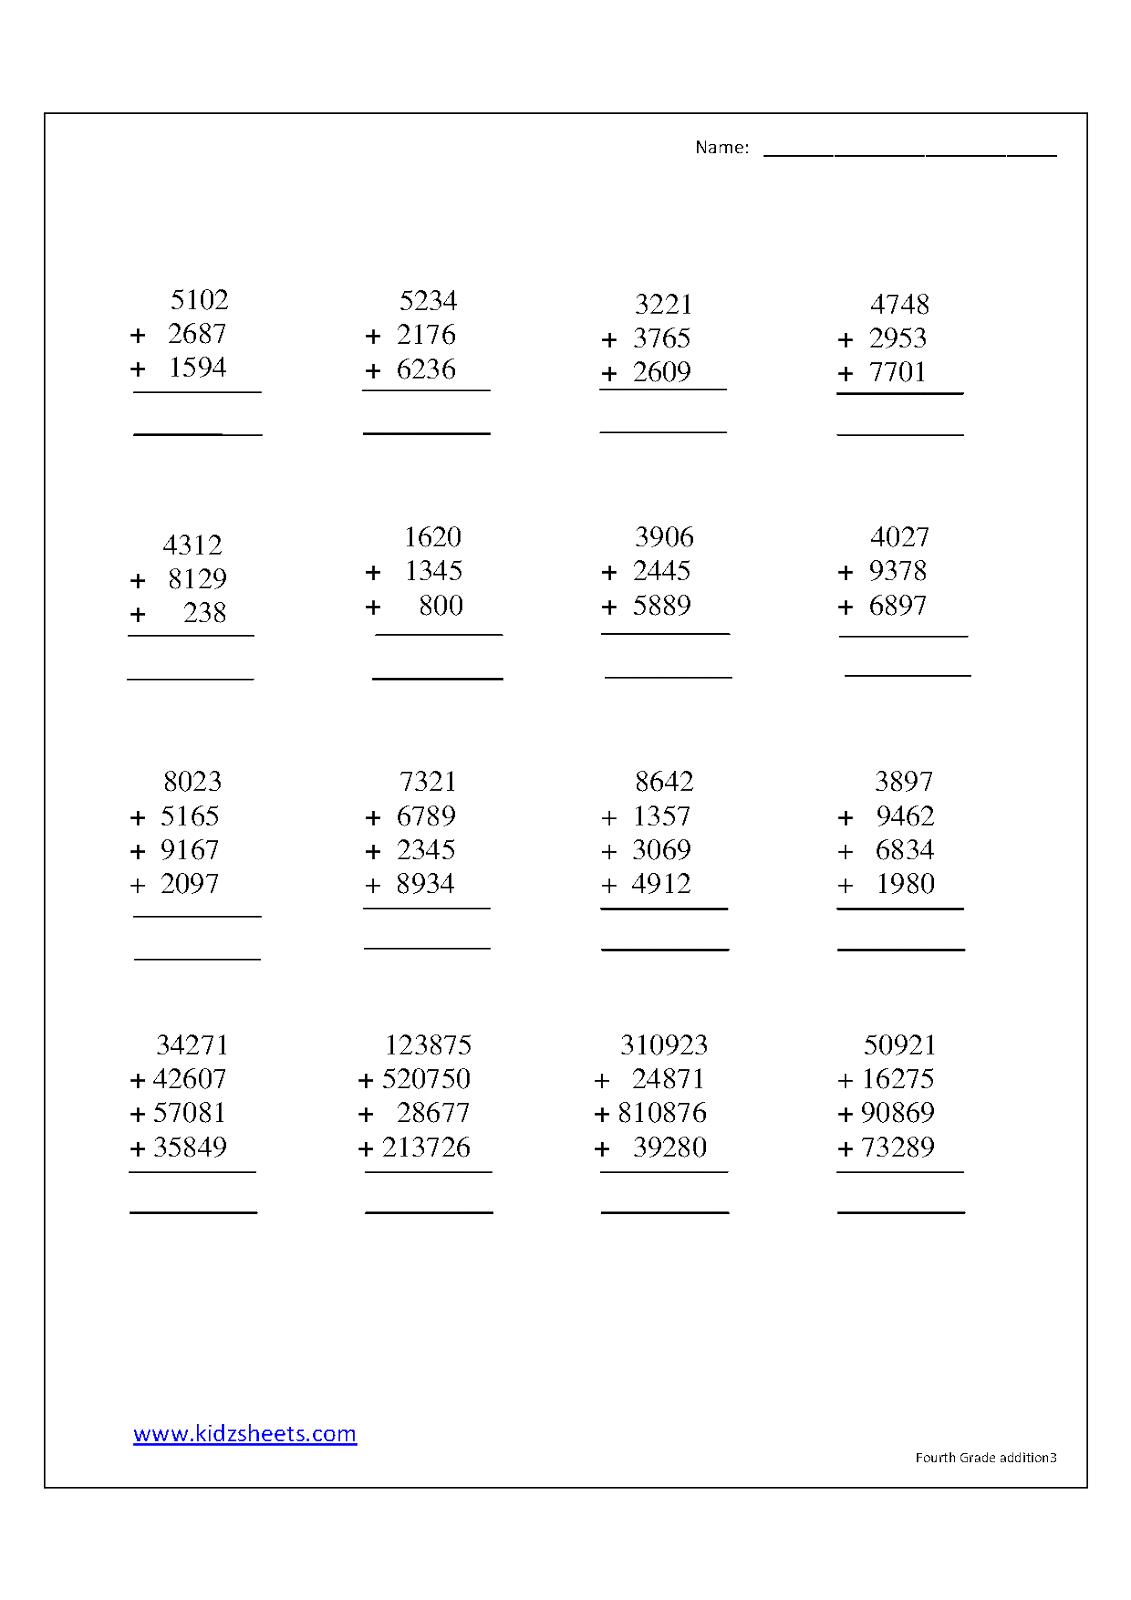 Kidz Worksheets Fourth Grade Addition Worksheet3